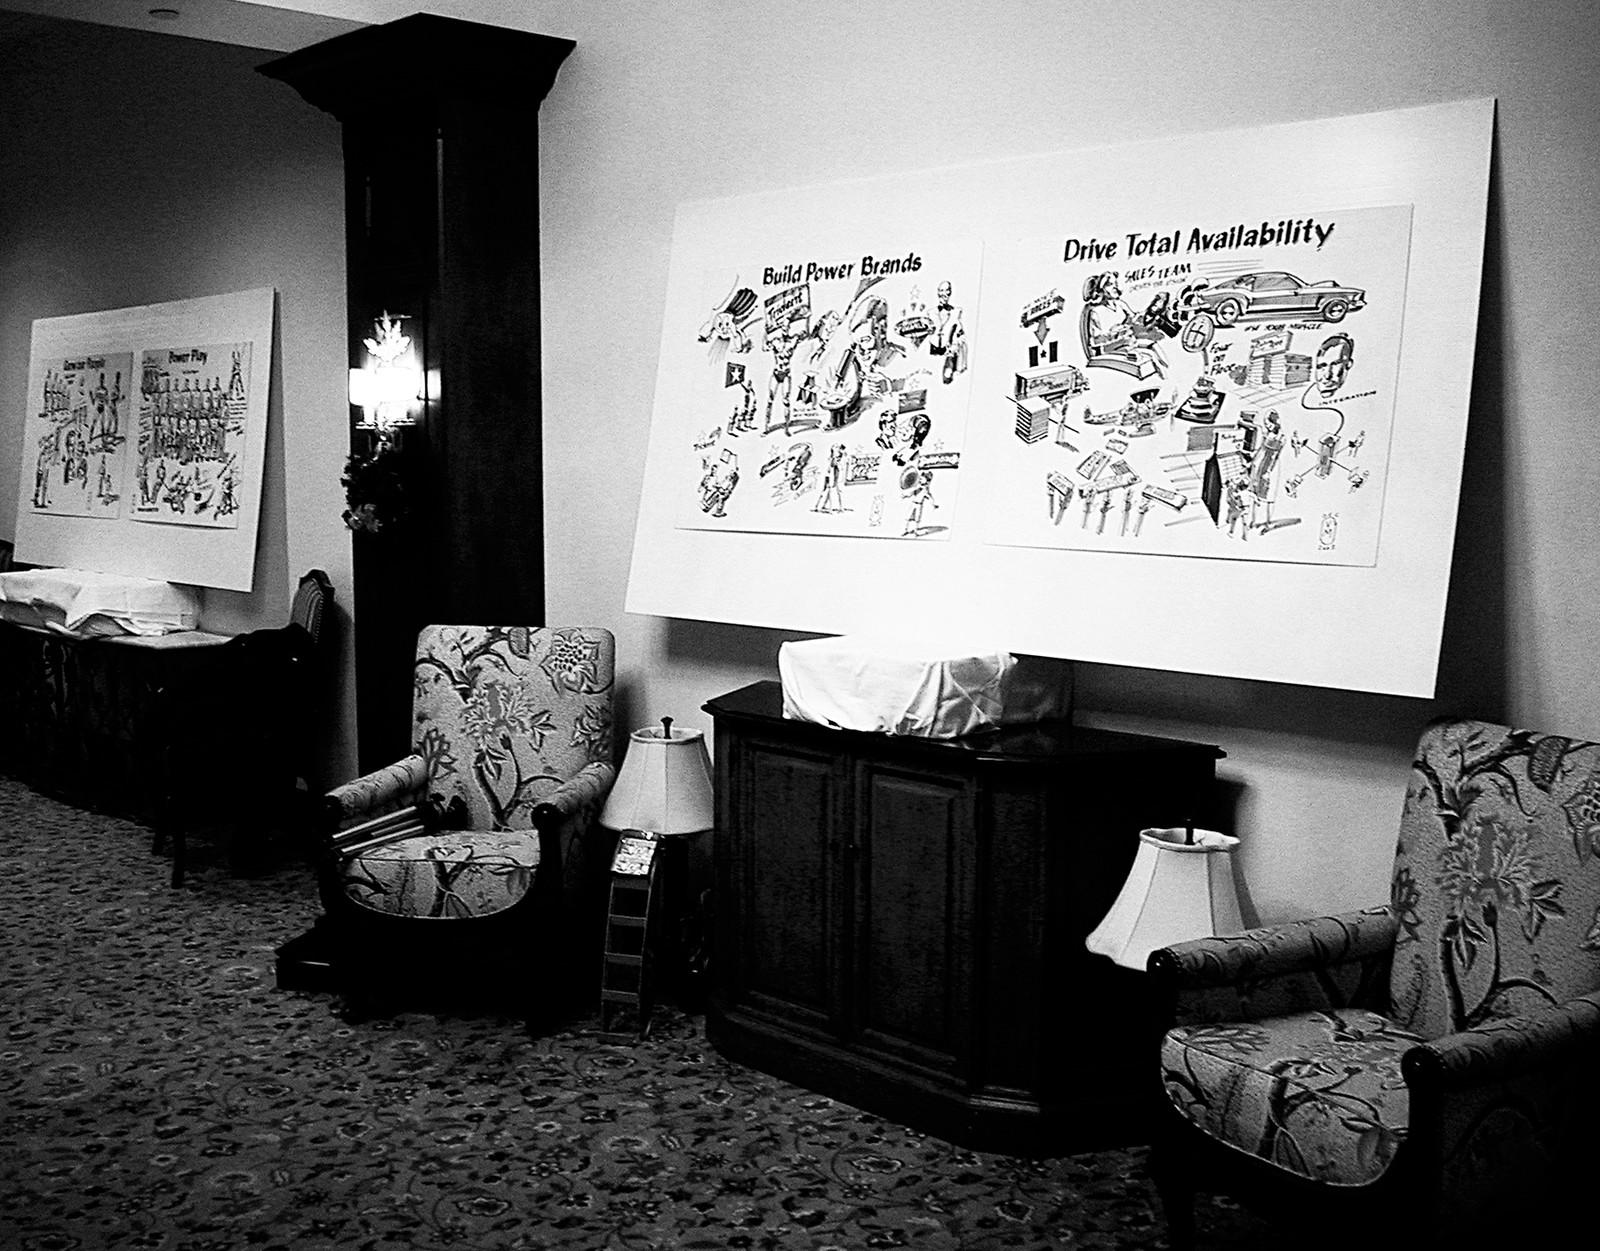 Displayed at the Cadbury/Adams national conference at the Deer Hurst Inn, Ontario, Canada.